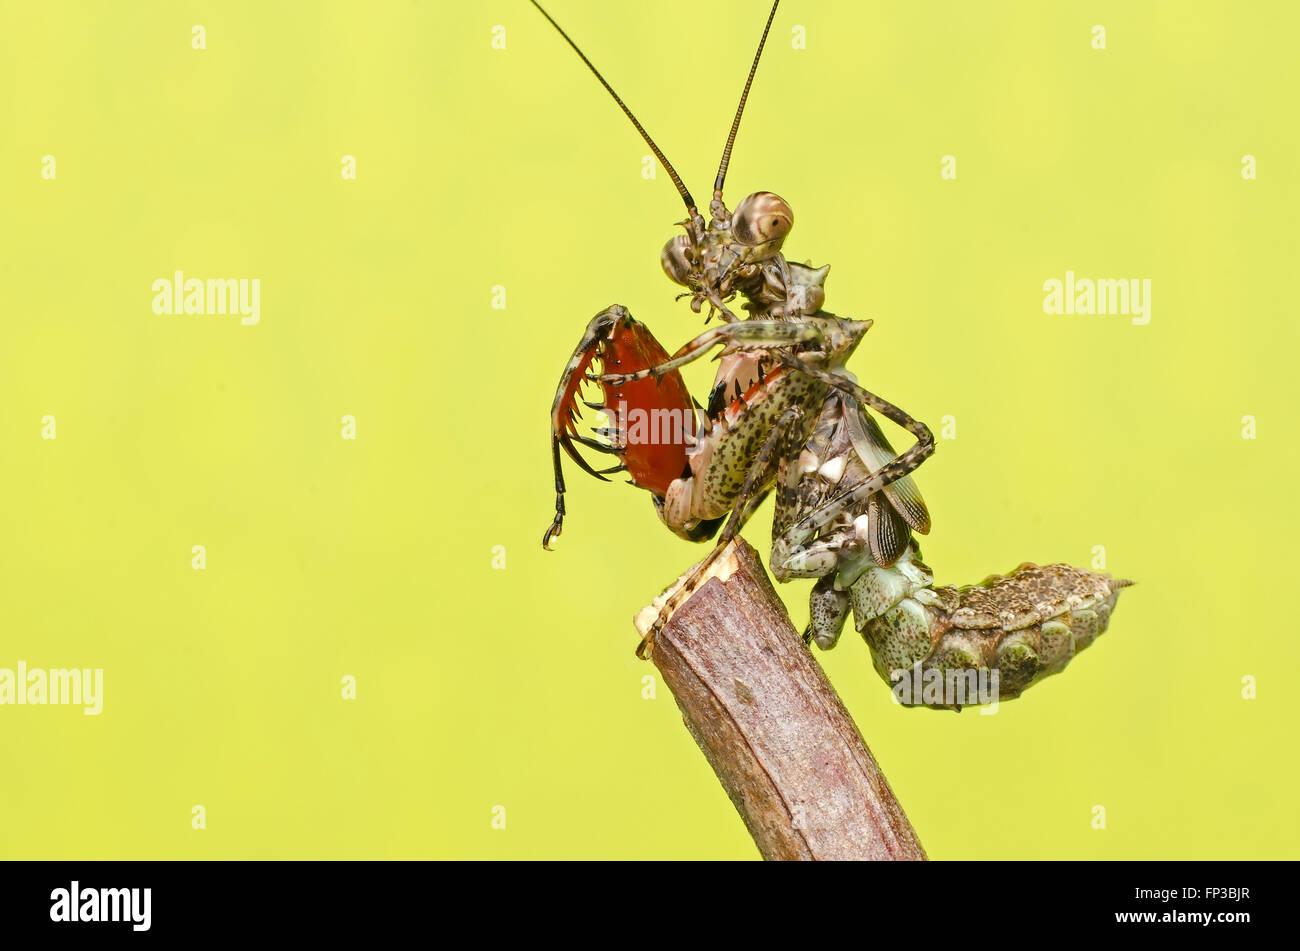 Gottesanbeterin. Pachymantis Bicingulata Nymphe Stockbild